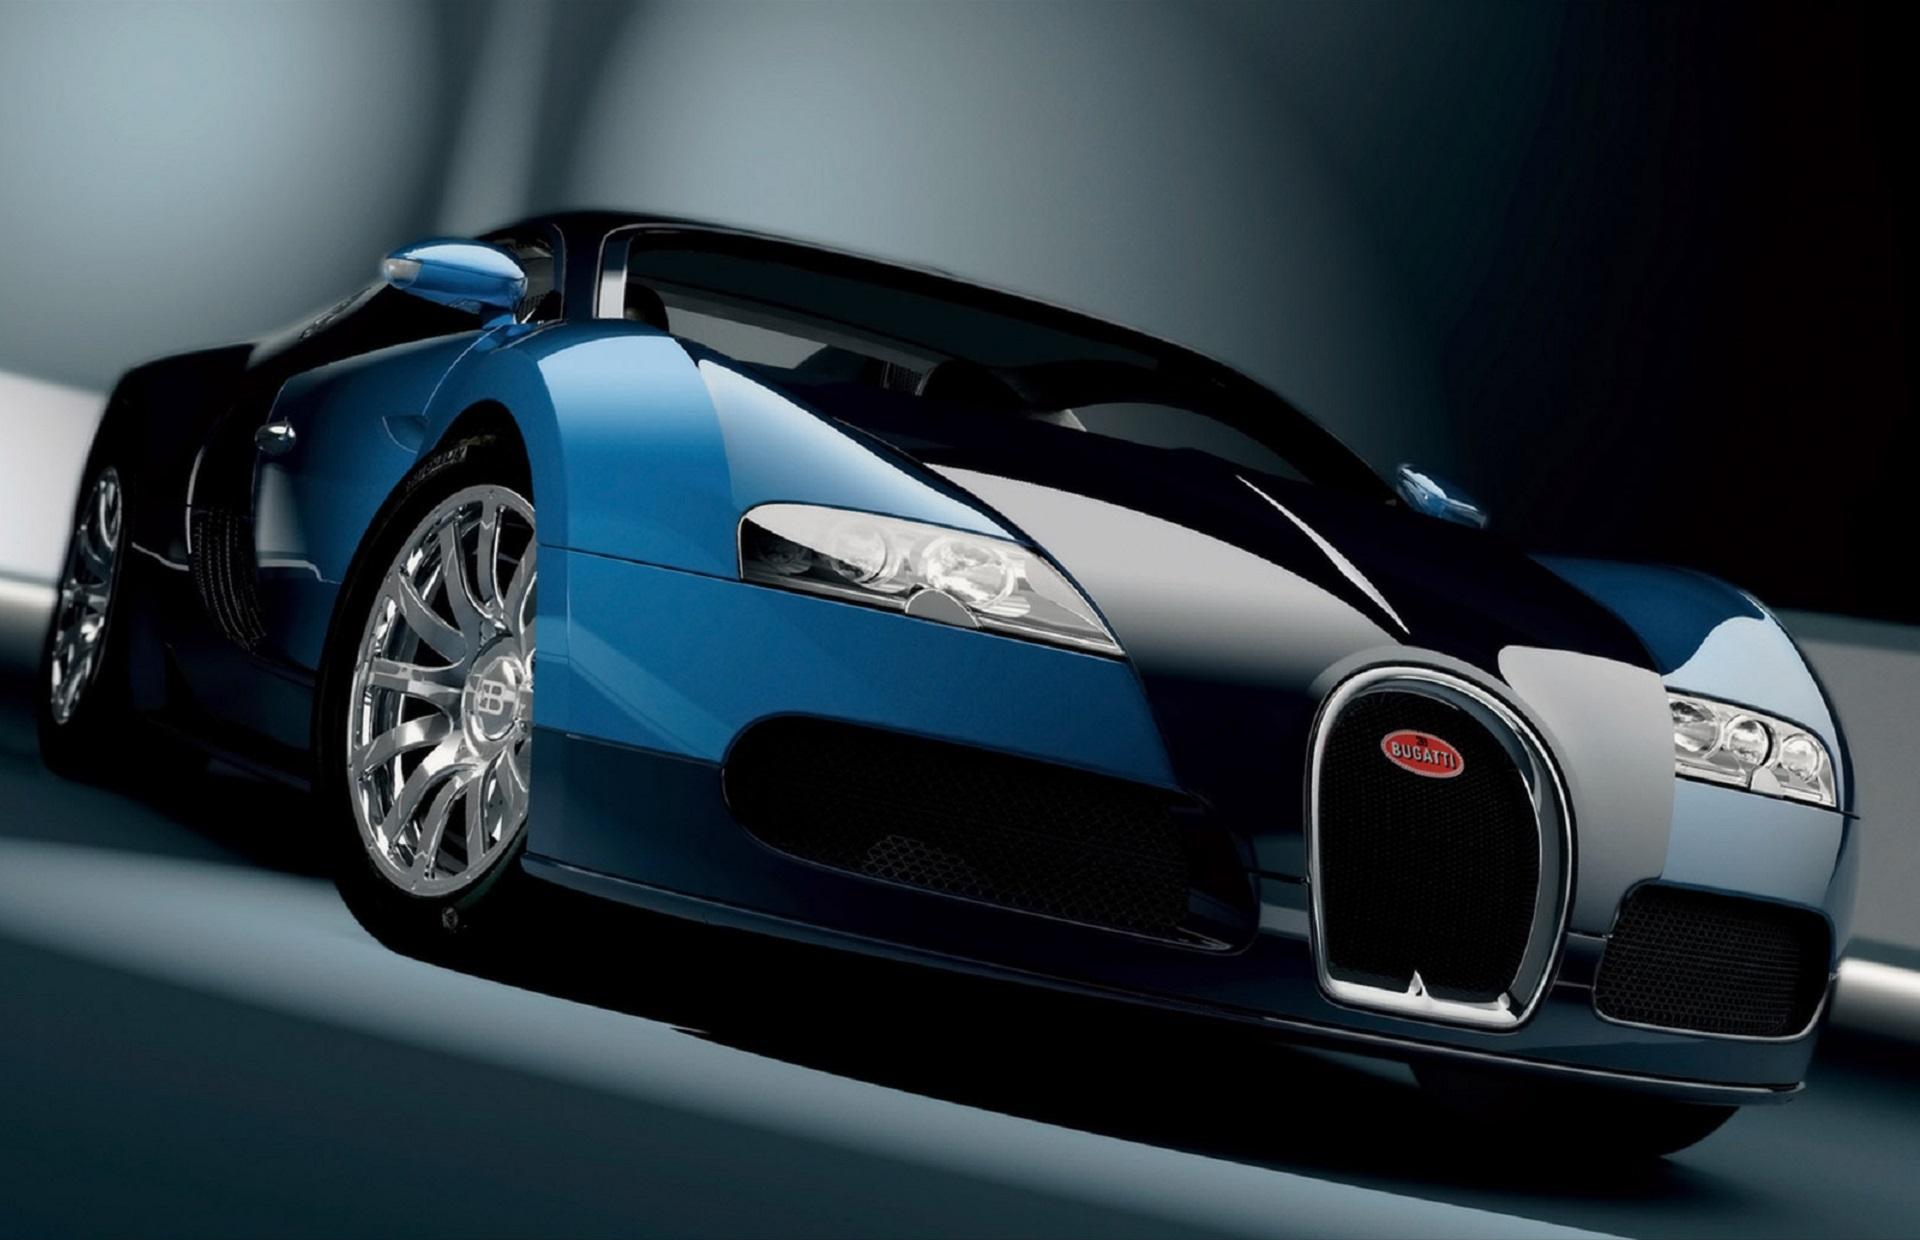 Bugatti Veyron High Quality Wallpapers